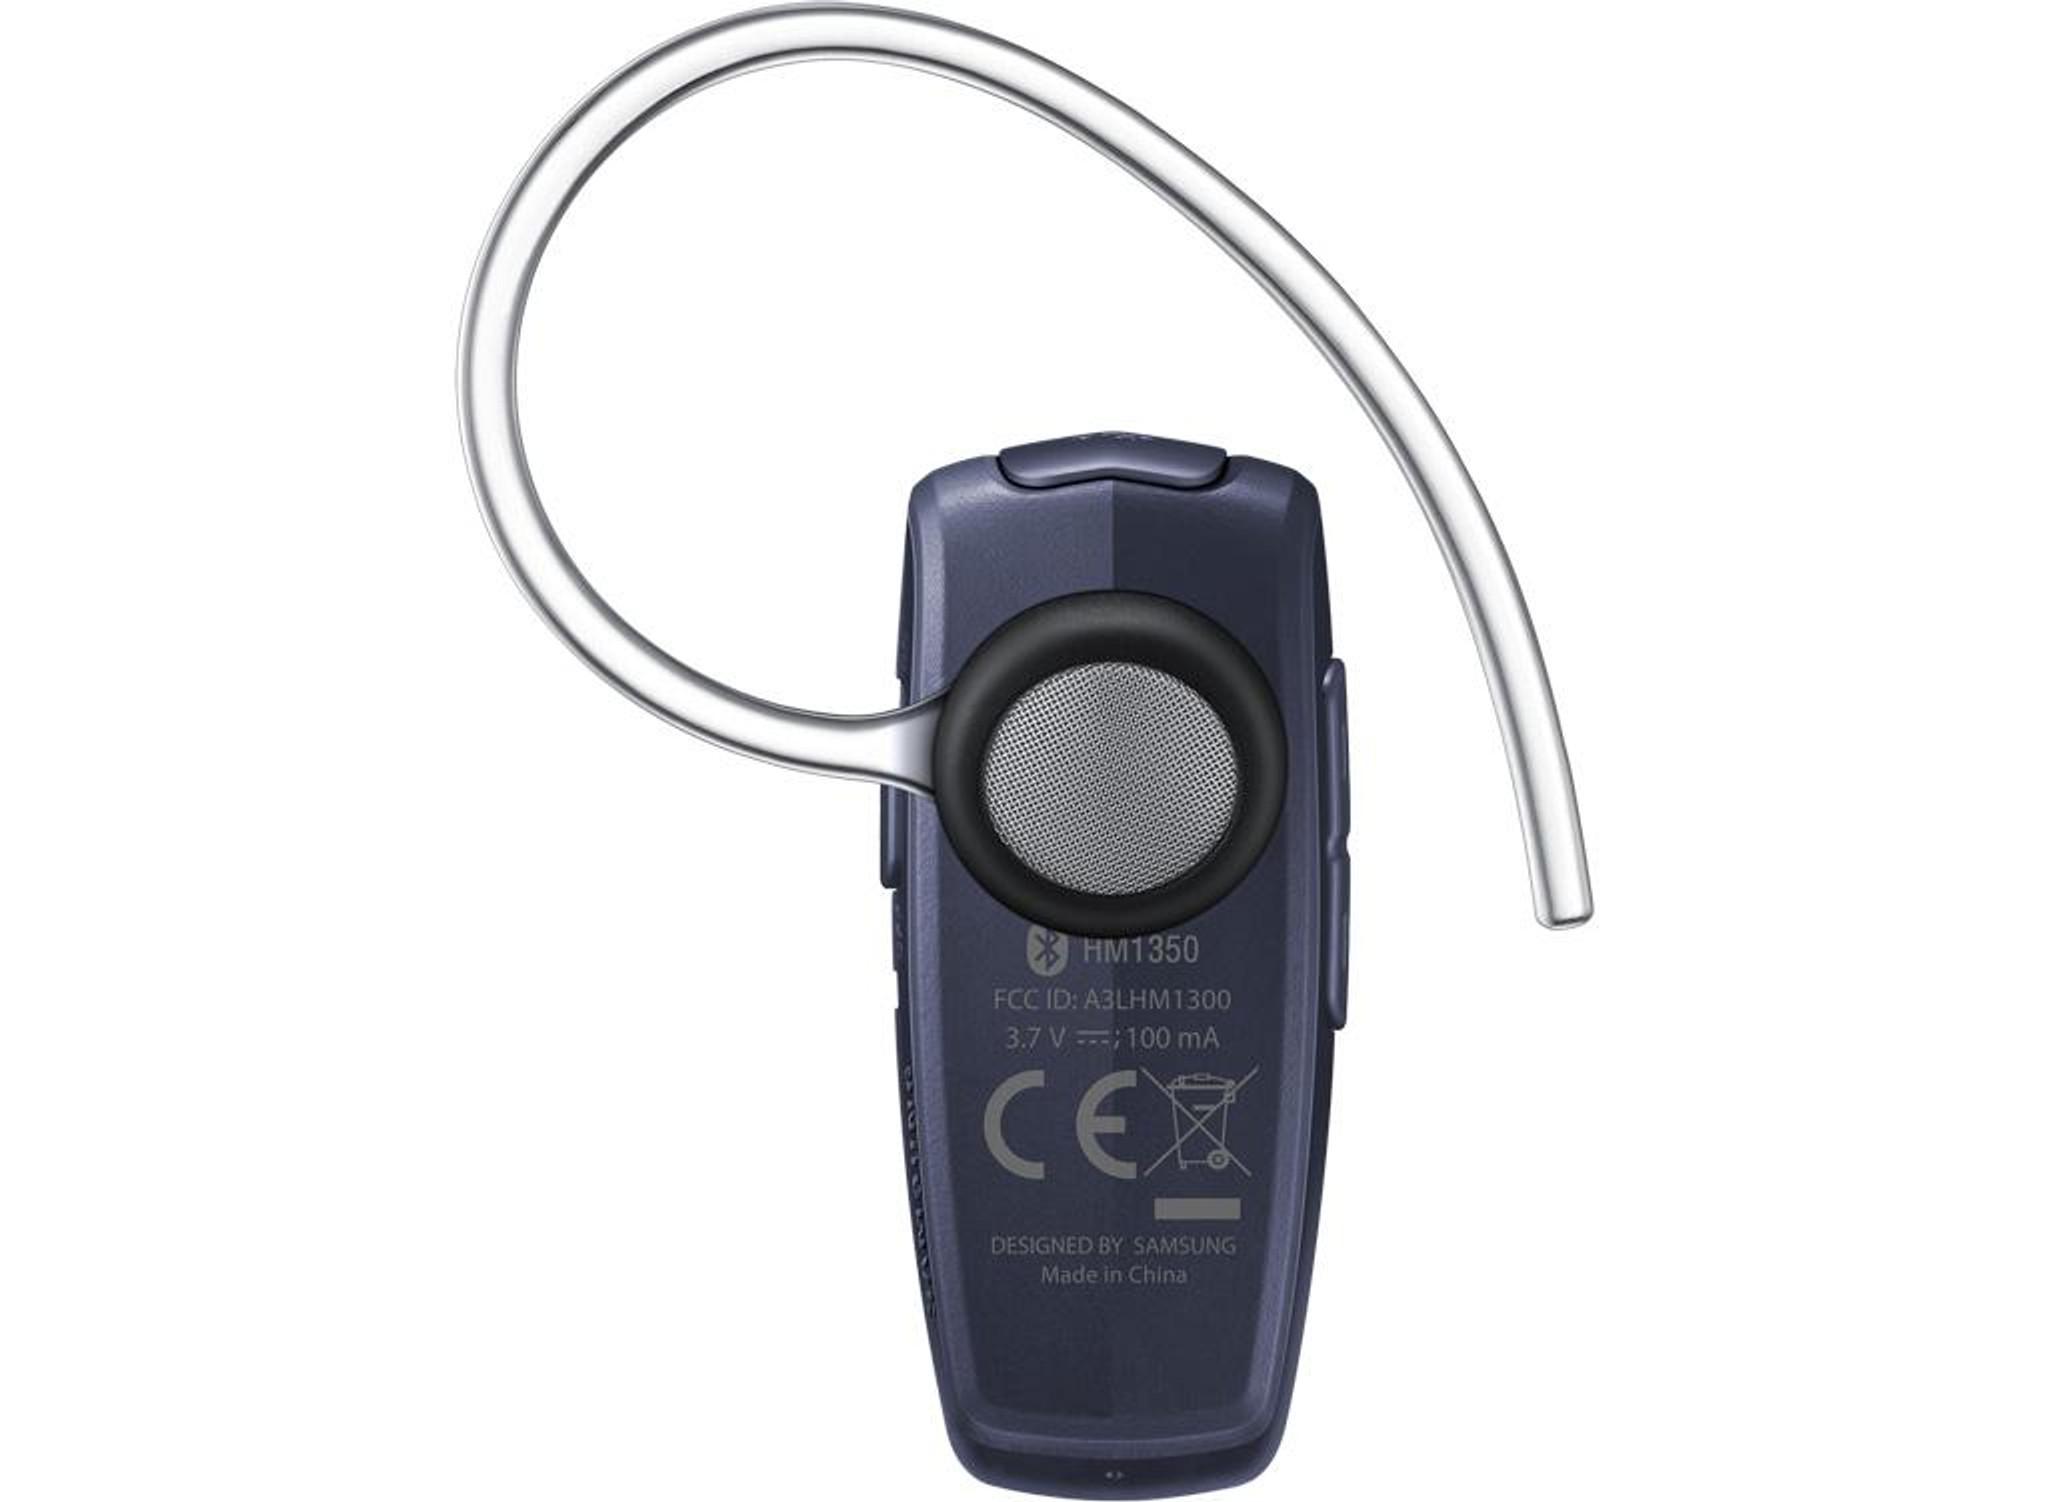 Samsung HM1350 Bluetooth Headset